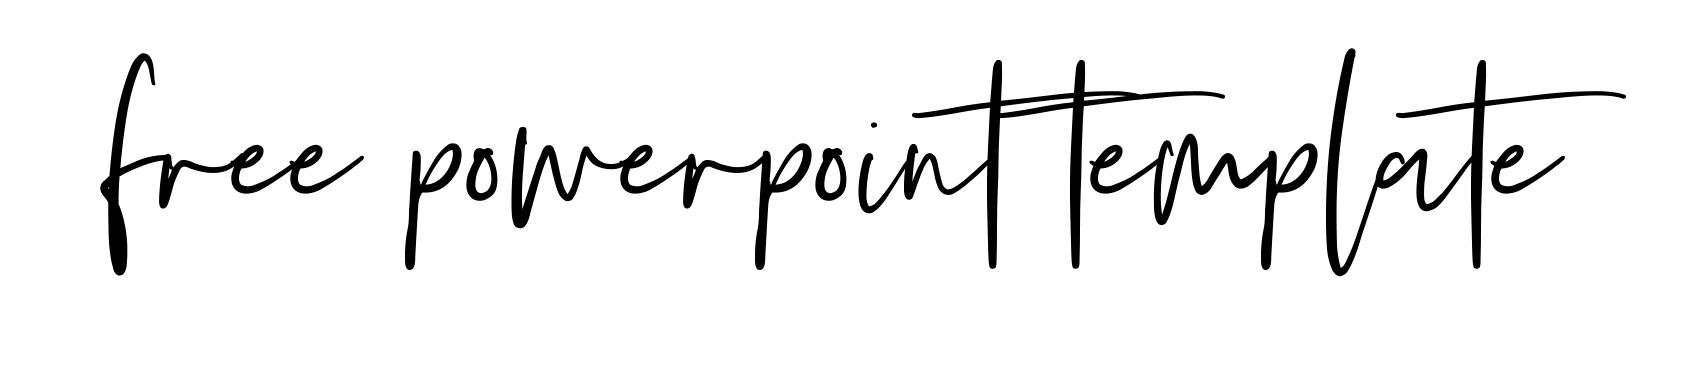 free powerpoint template orlov design co.jpg